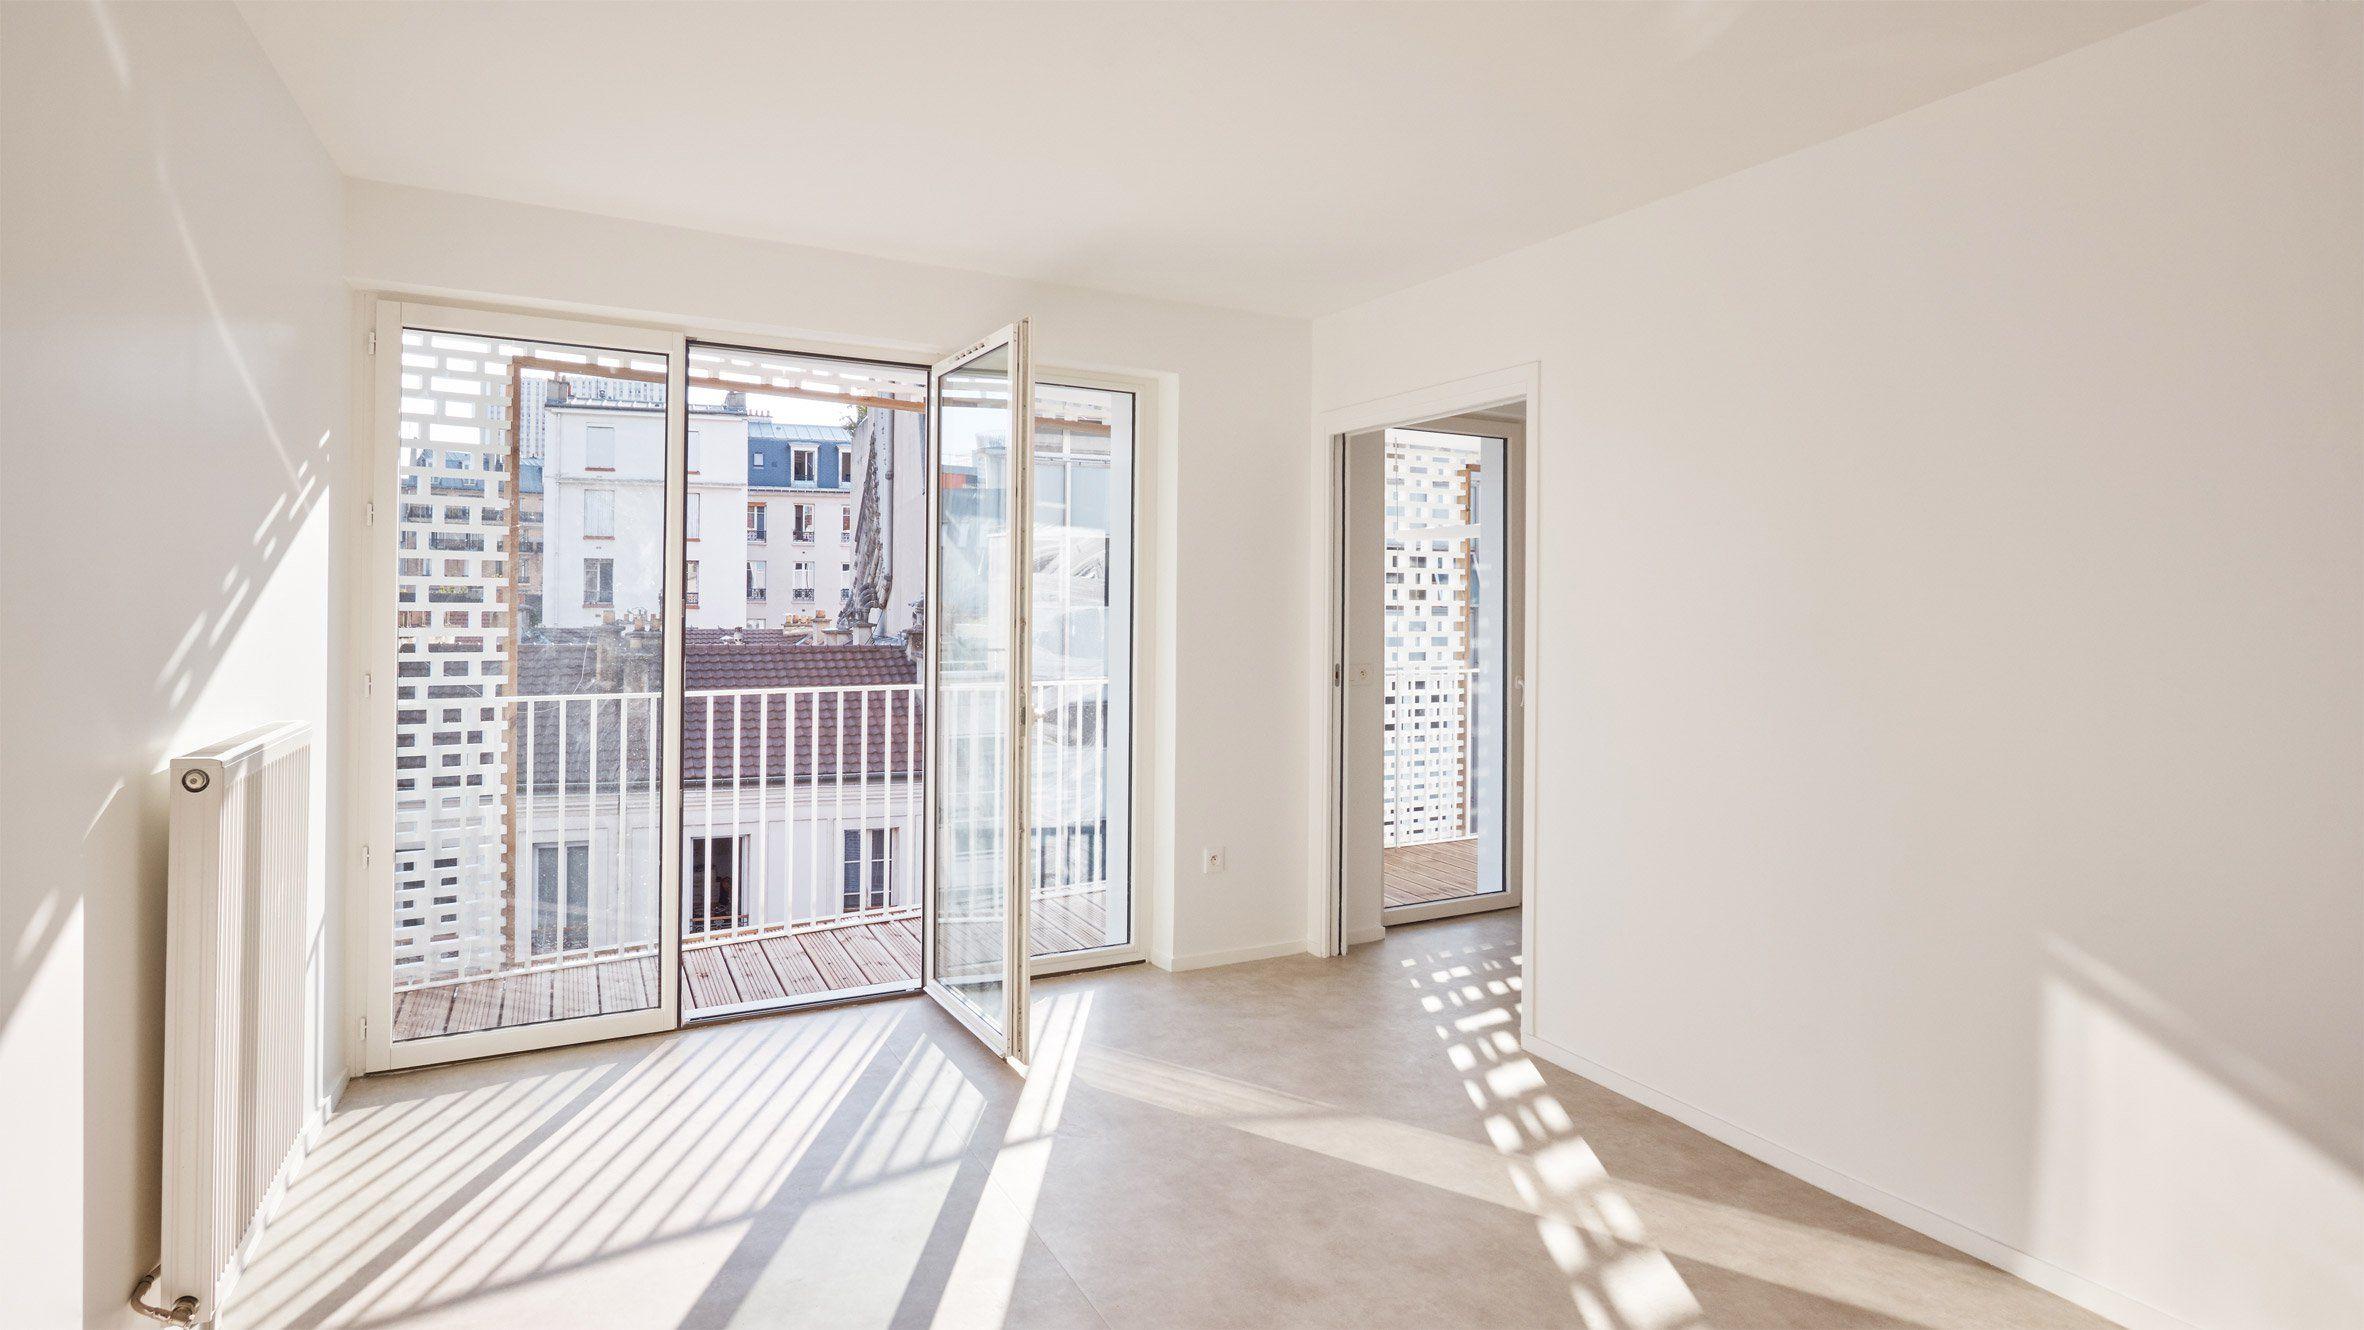 Balcony design ideas in apartment grenoble france home design and - Odile Guzy Architectes Adds Lattice Screens To Paris Apartment Block Facade